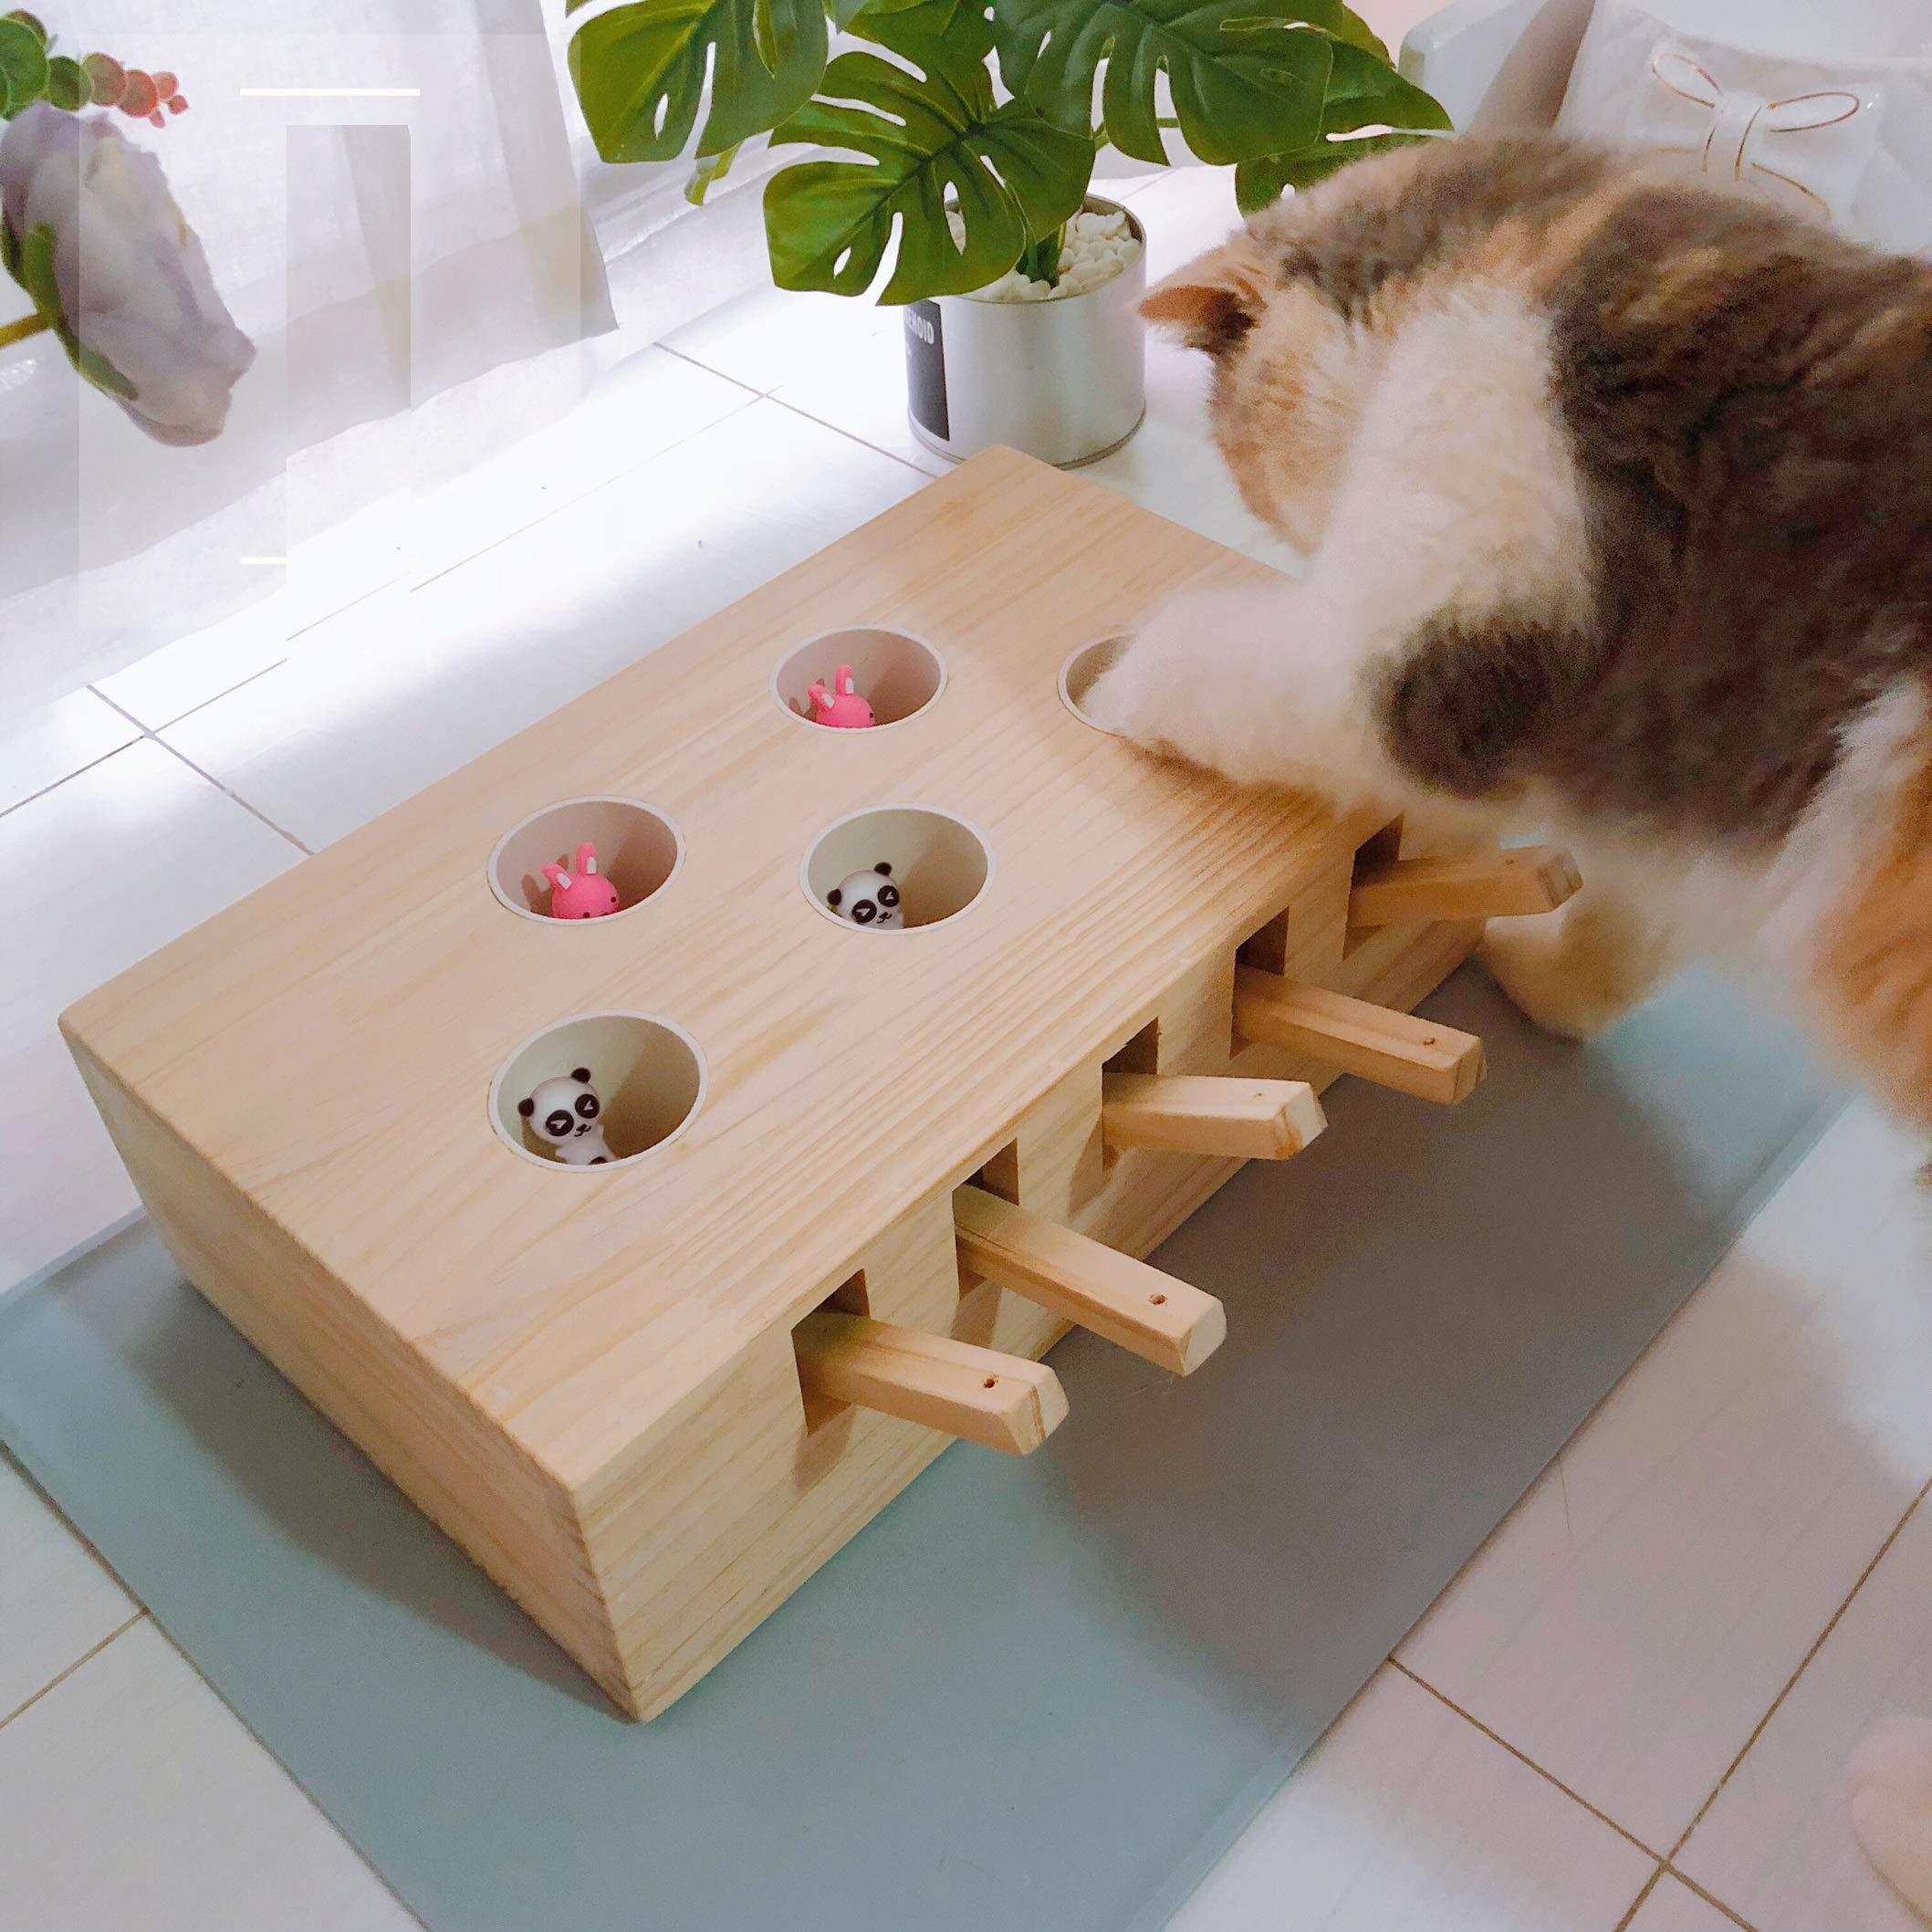 auspiciousign Juego de la topo interactiva caja a juguete gato gatito Puzzle de madera maciza sólido con ratón hámster para mascotas: Amazon.es: Productos para mascotas